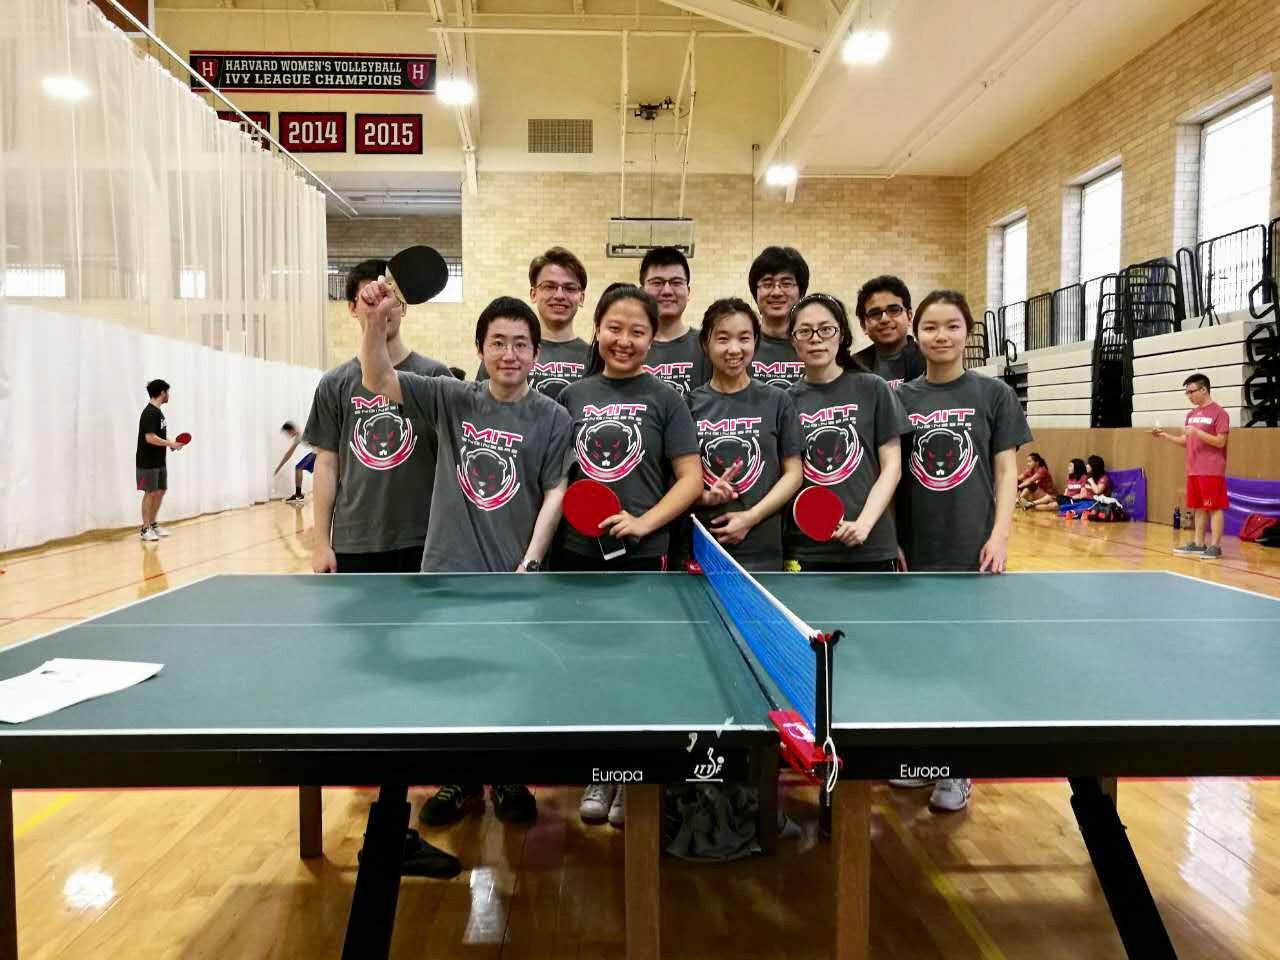 Mit Table Tennis Club